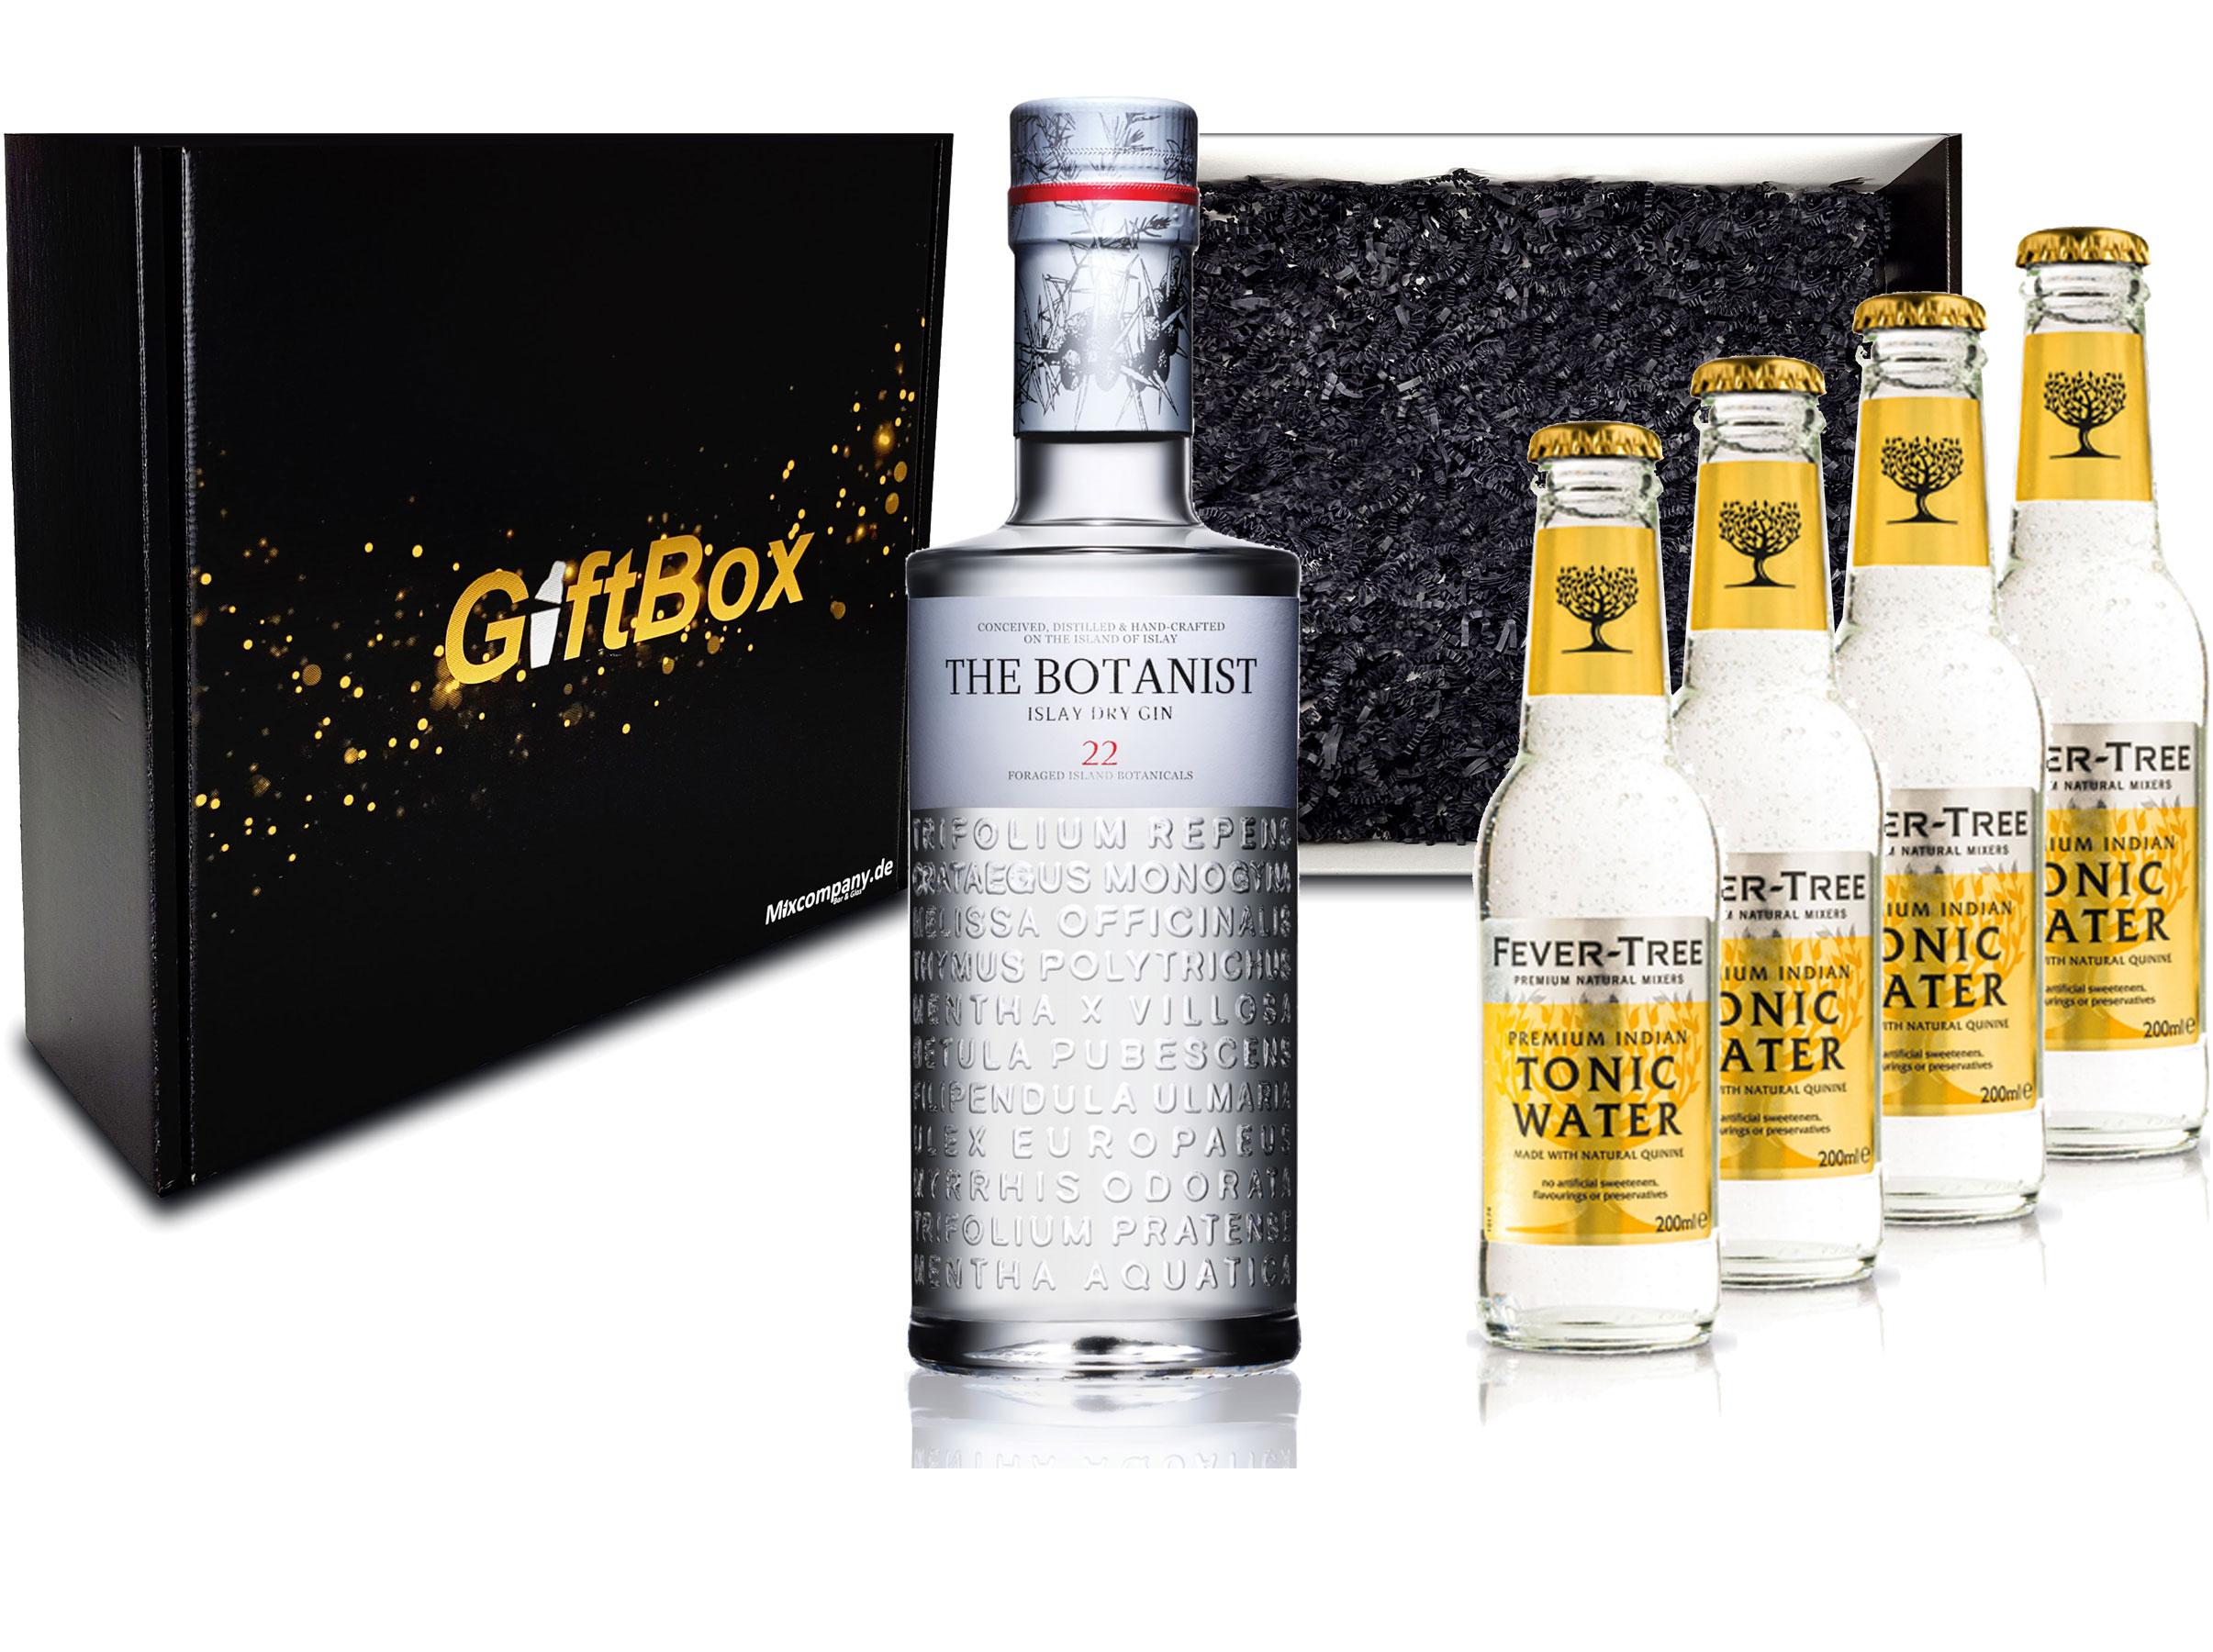 Gin Tonic Giftbox Geschenkset - The Botanist Islay Dry Gin 0,7l 700ml (46% Vol) + 4x Fever Tree Tonic Water 200ml inkl. Pfand MEHRWEG + Geschenkverpackung